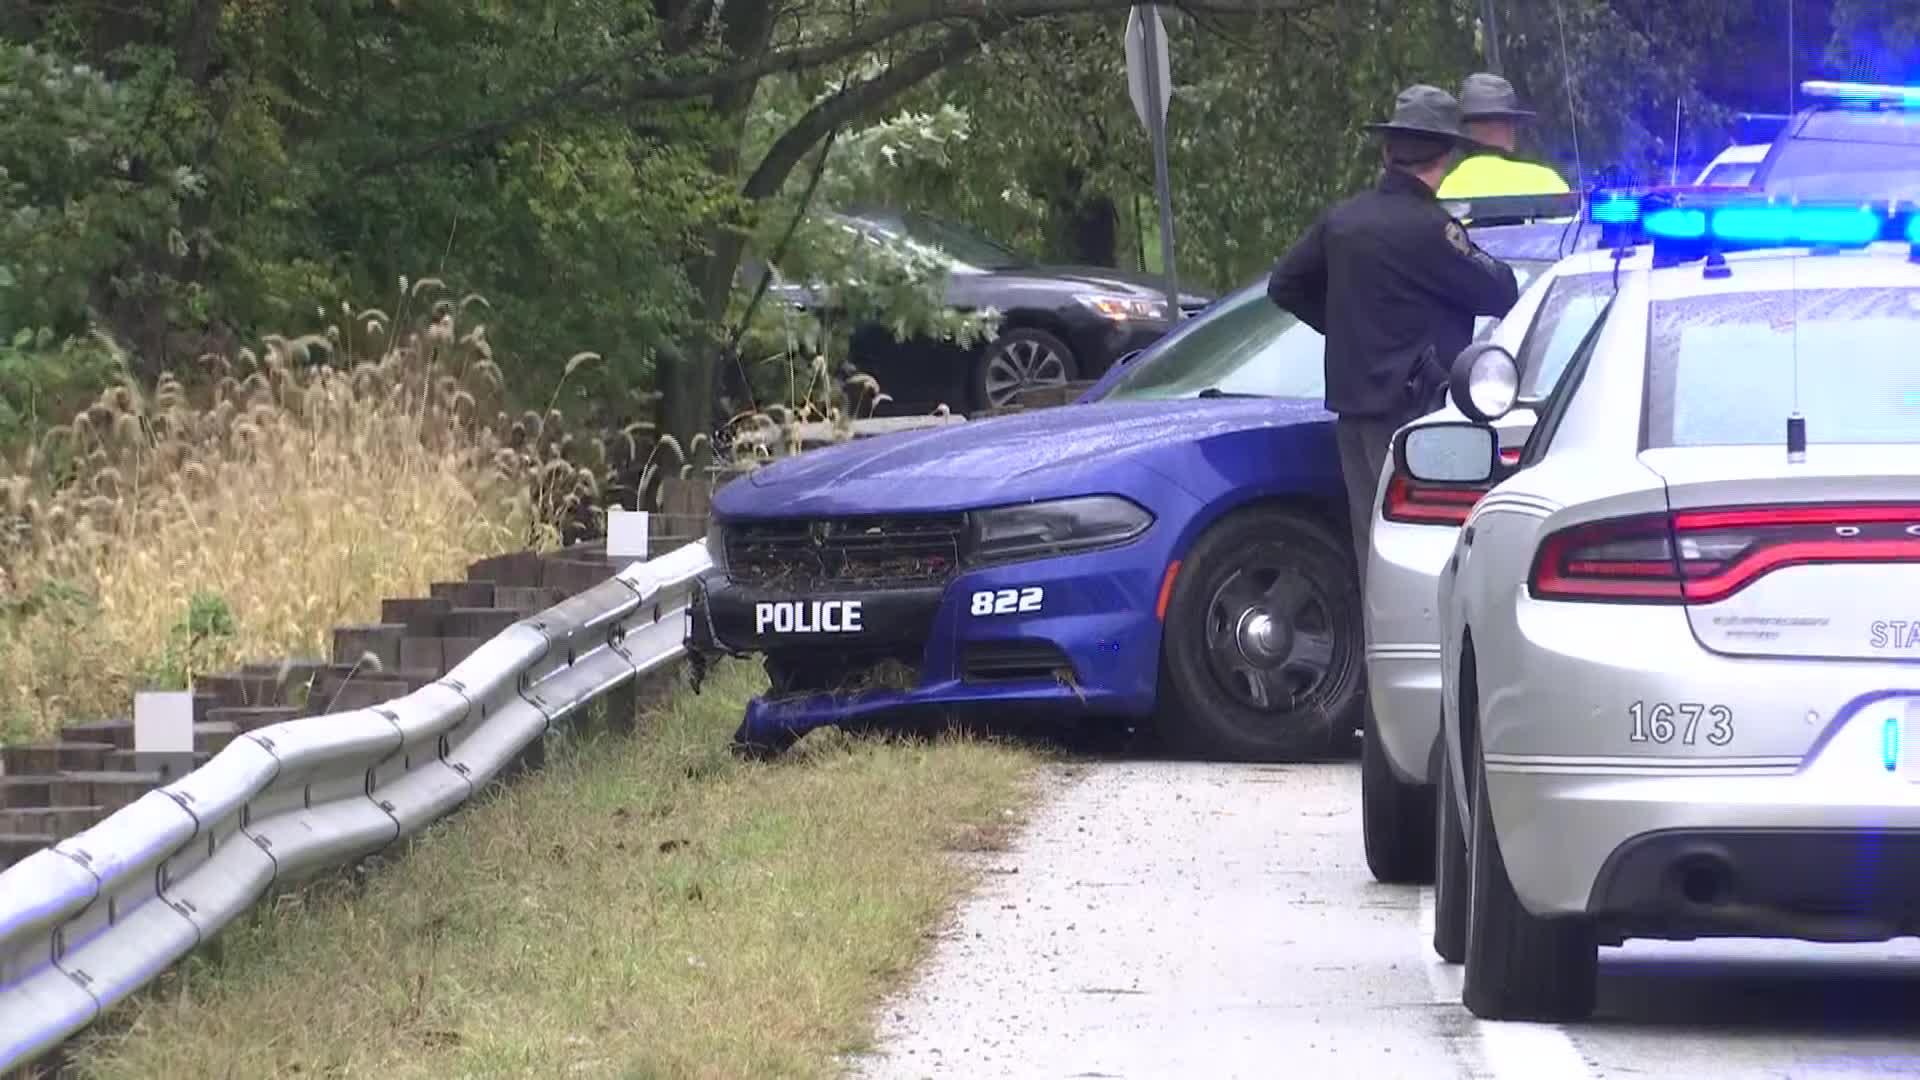 Richmond police cruiser after a crash in Ohio